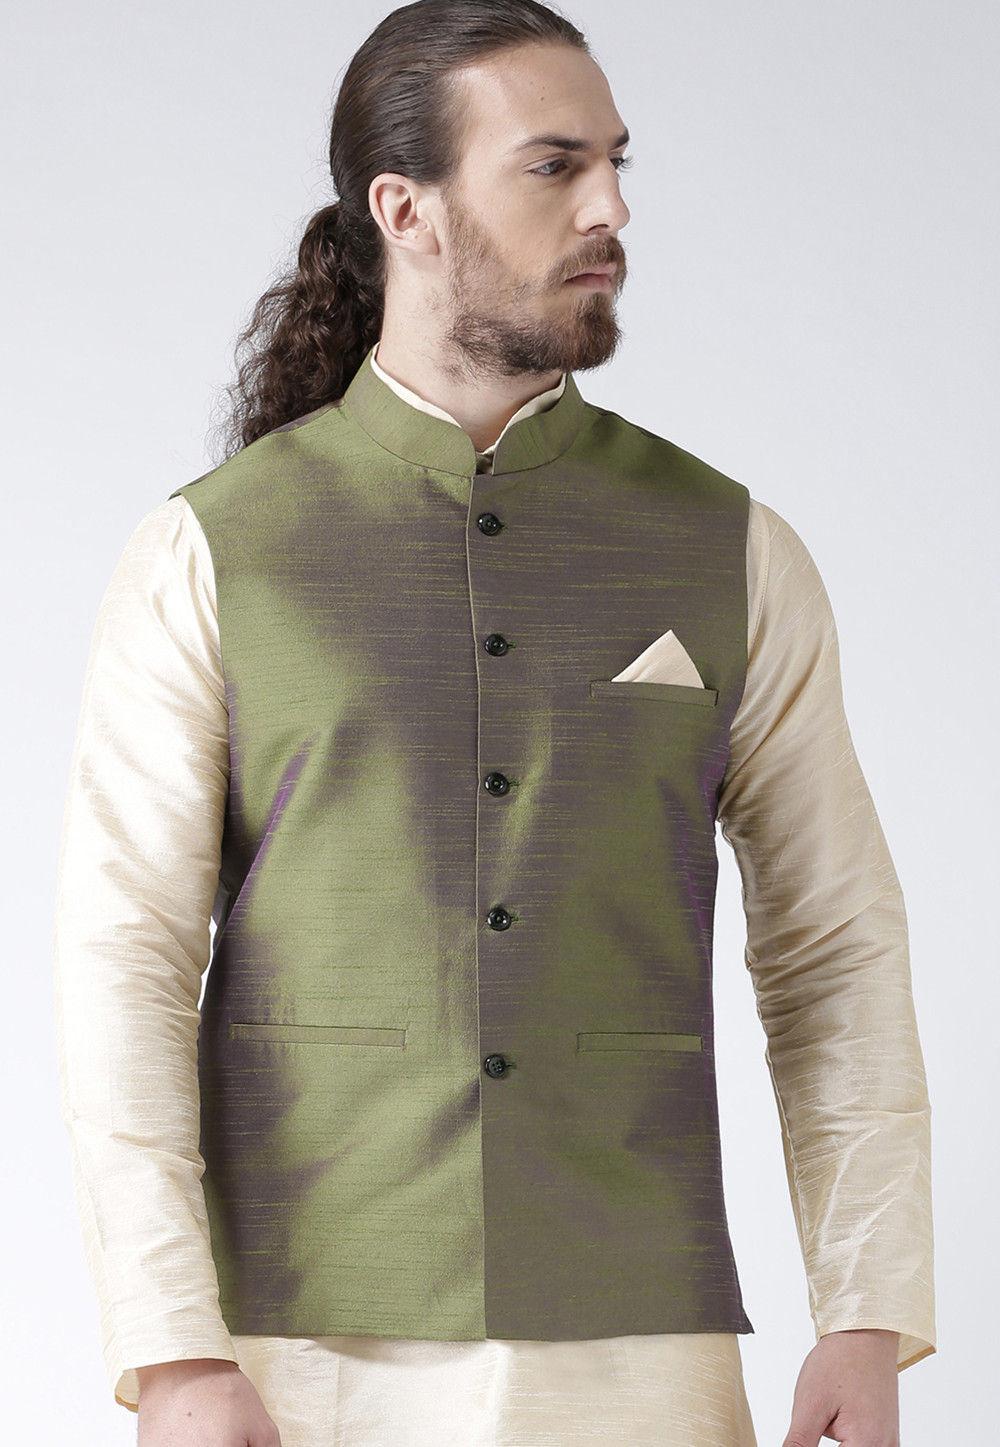 a1f6eaf30cb Solid Color Dupion Silk Nehru Jacket in Olive Green : MHT46